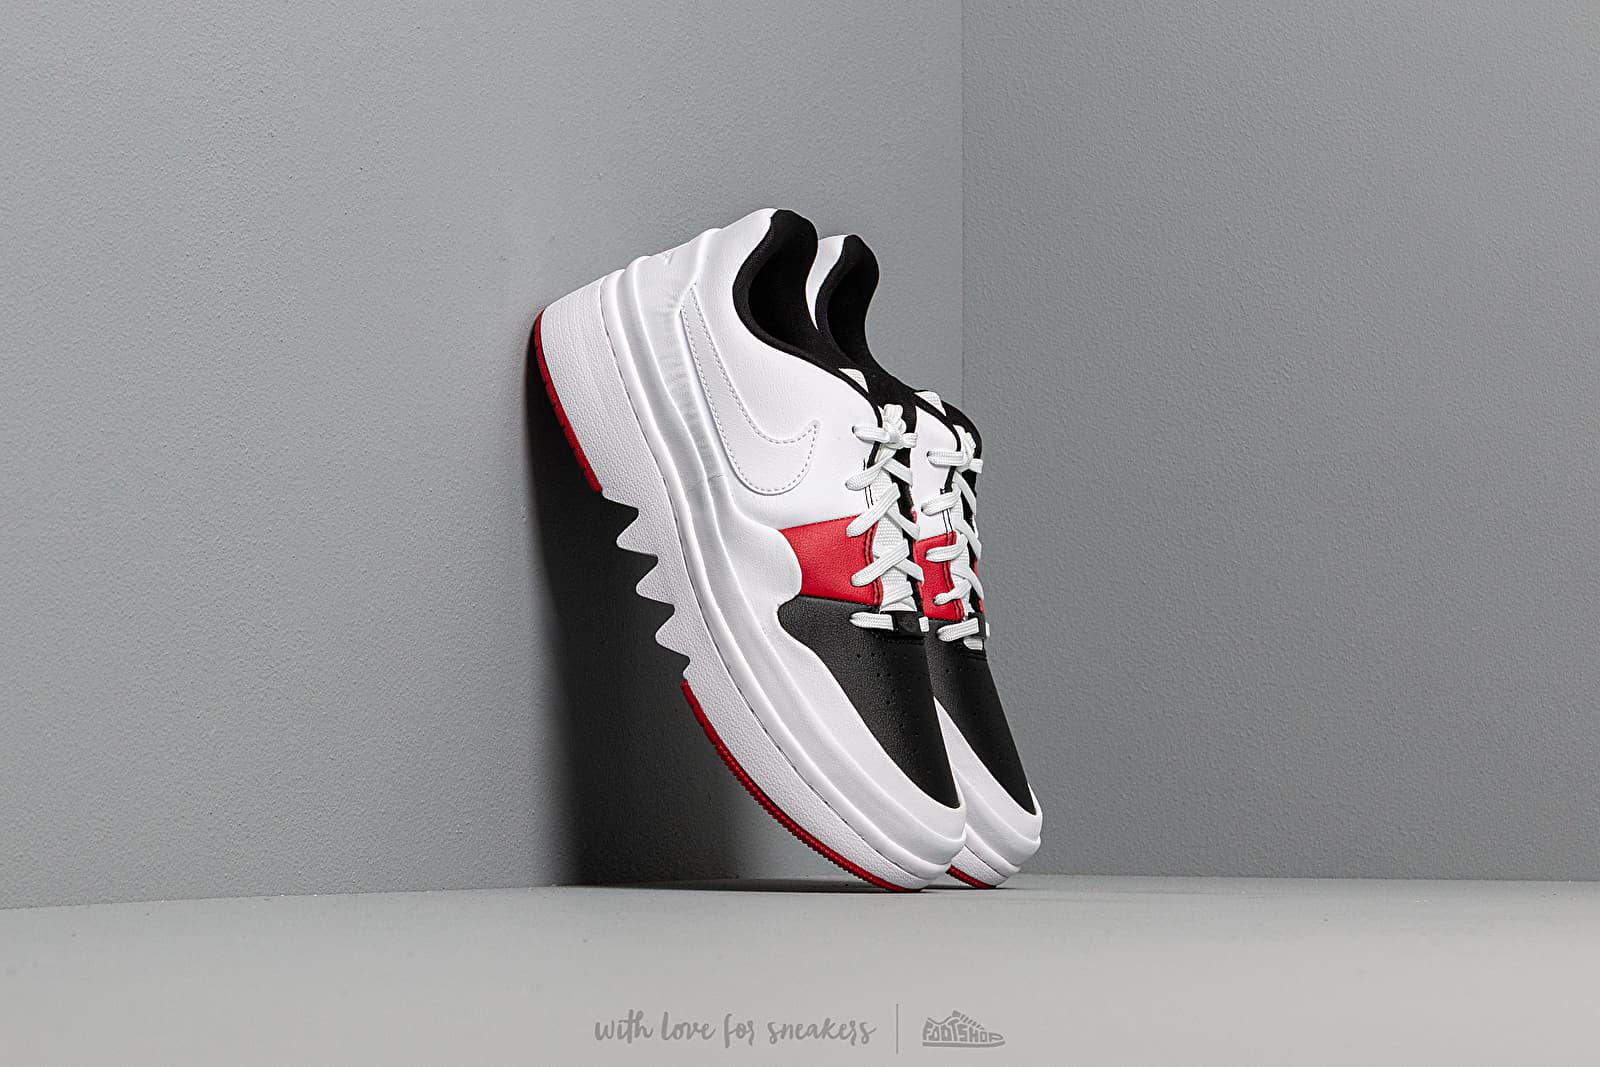 Air Jordan Wmns 1 Jester XX Low Laced White Gym Red Black | Footshop